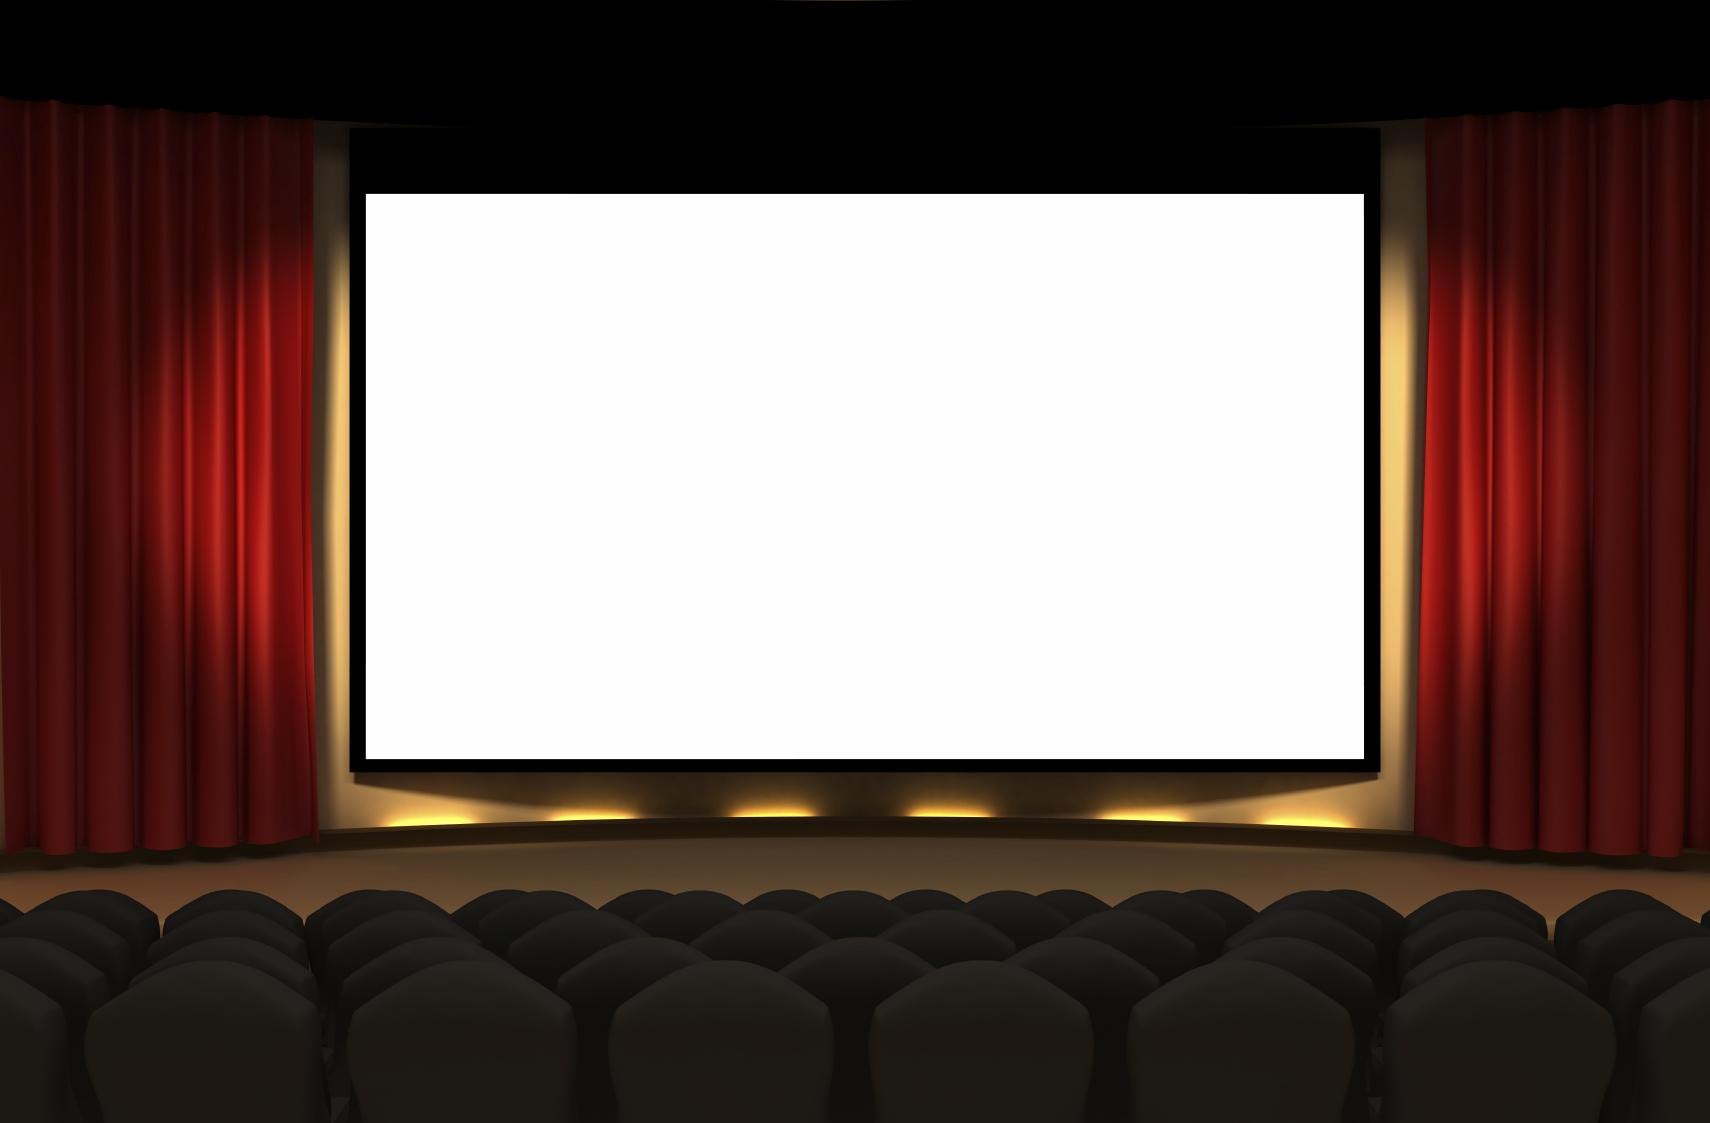 Screen clipart cinema #3